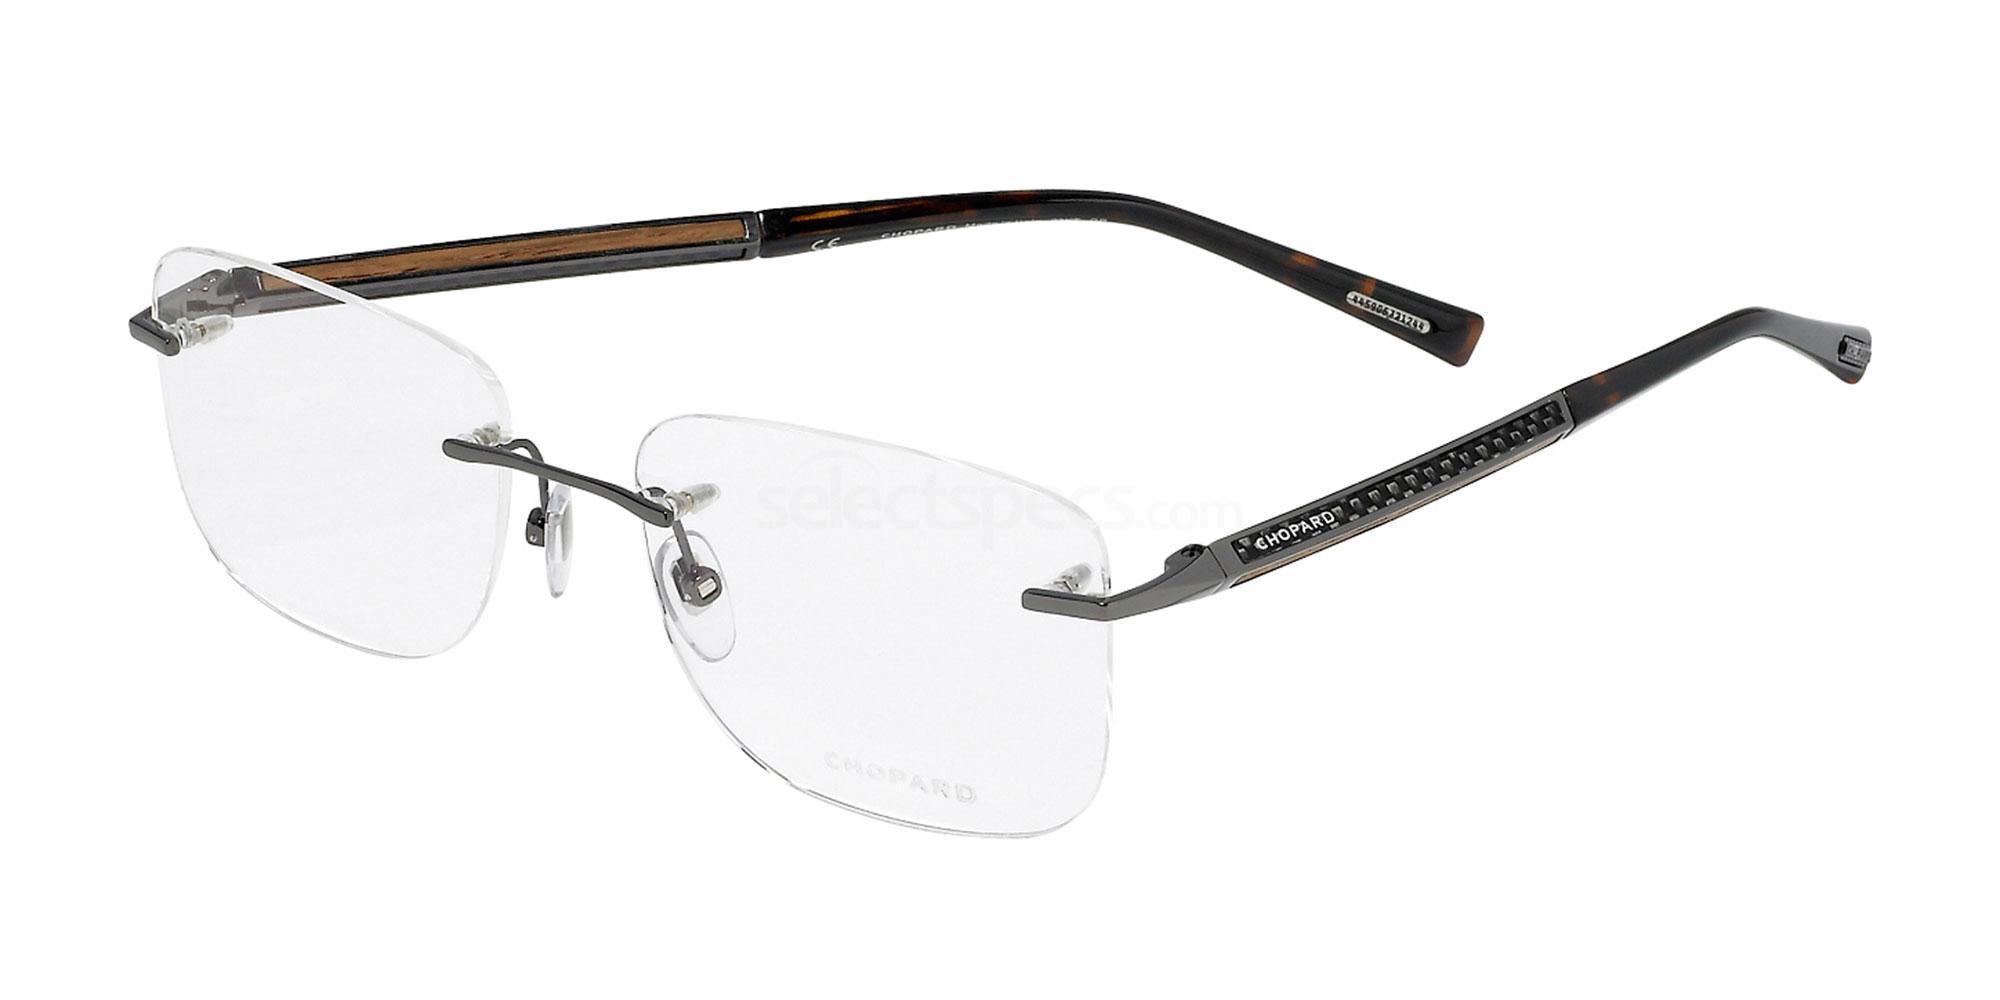 0568 VCHC74 Glasses, Chopard